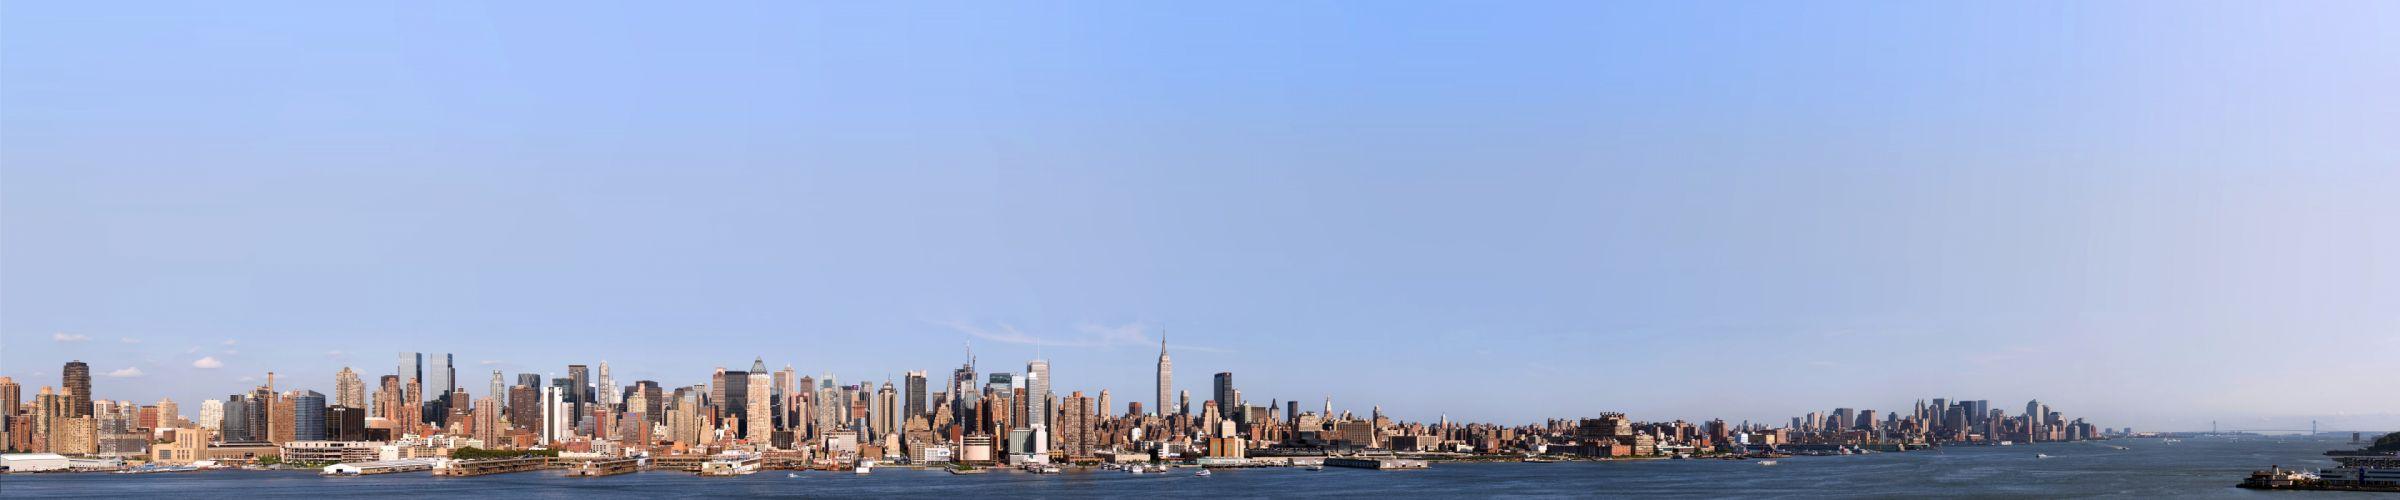 New York Manhattan Hudson River bay r wallpaper